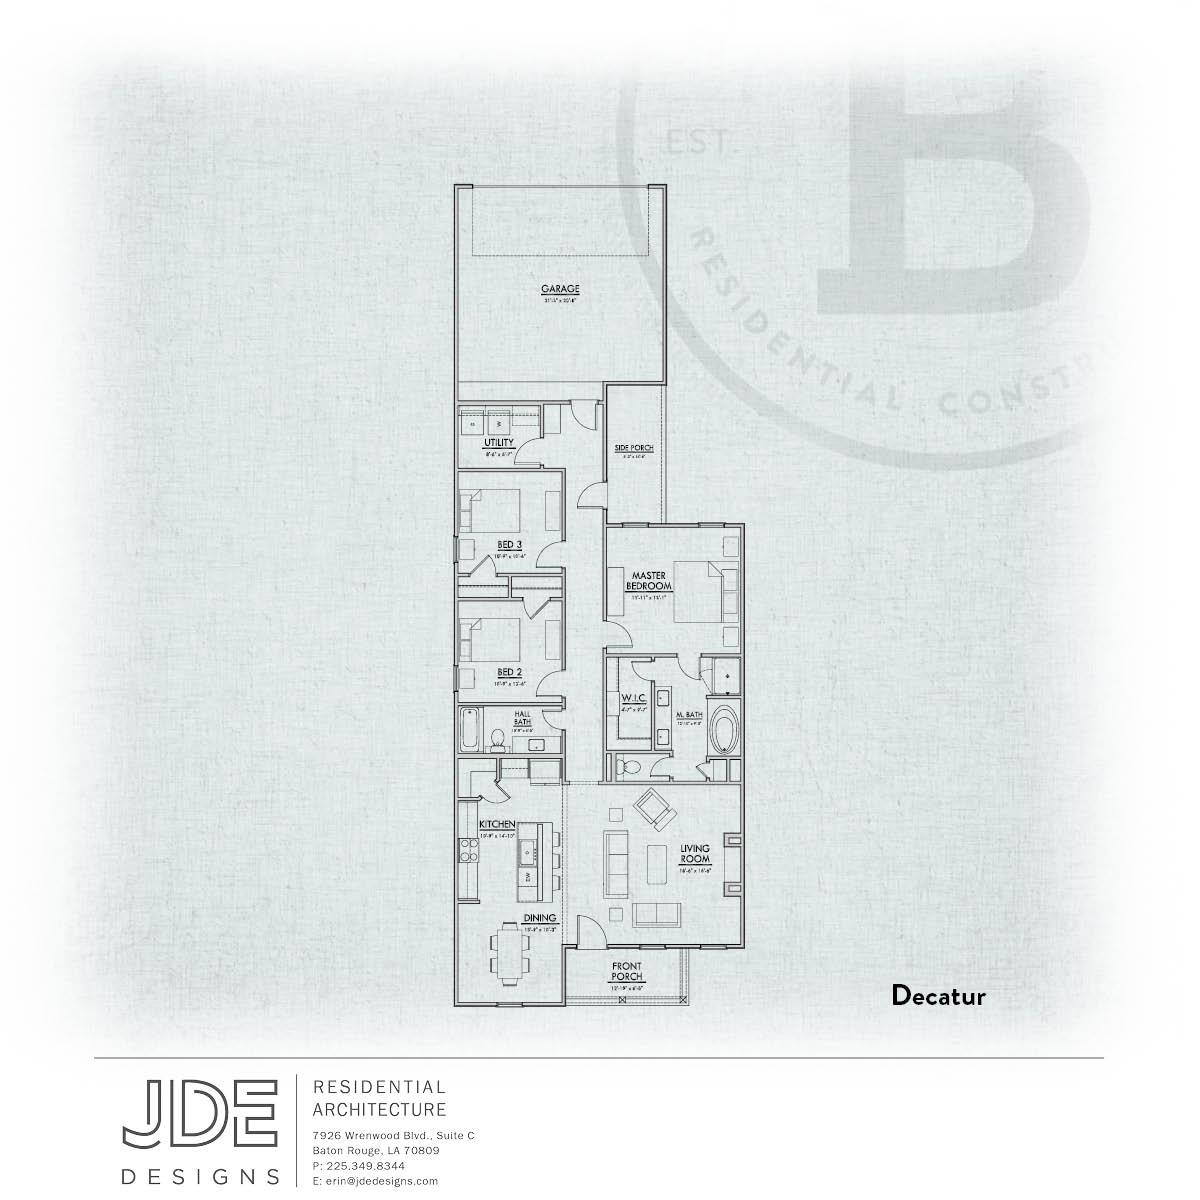 Decatur Elevation B.2